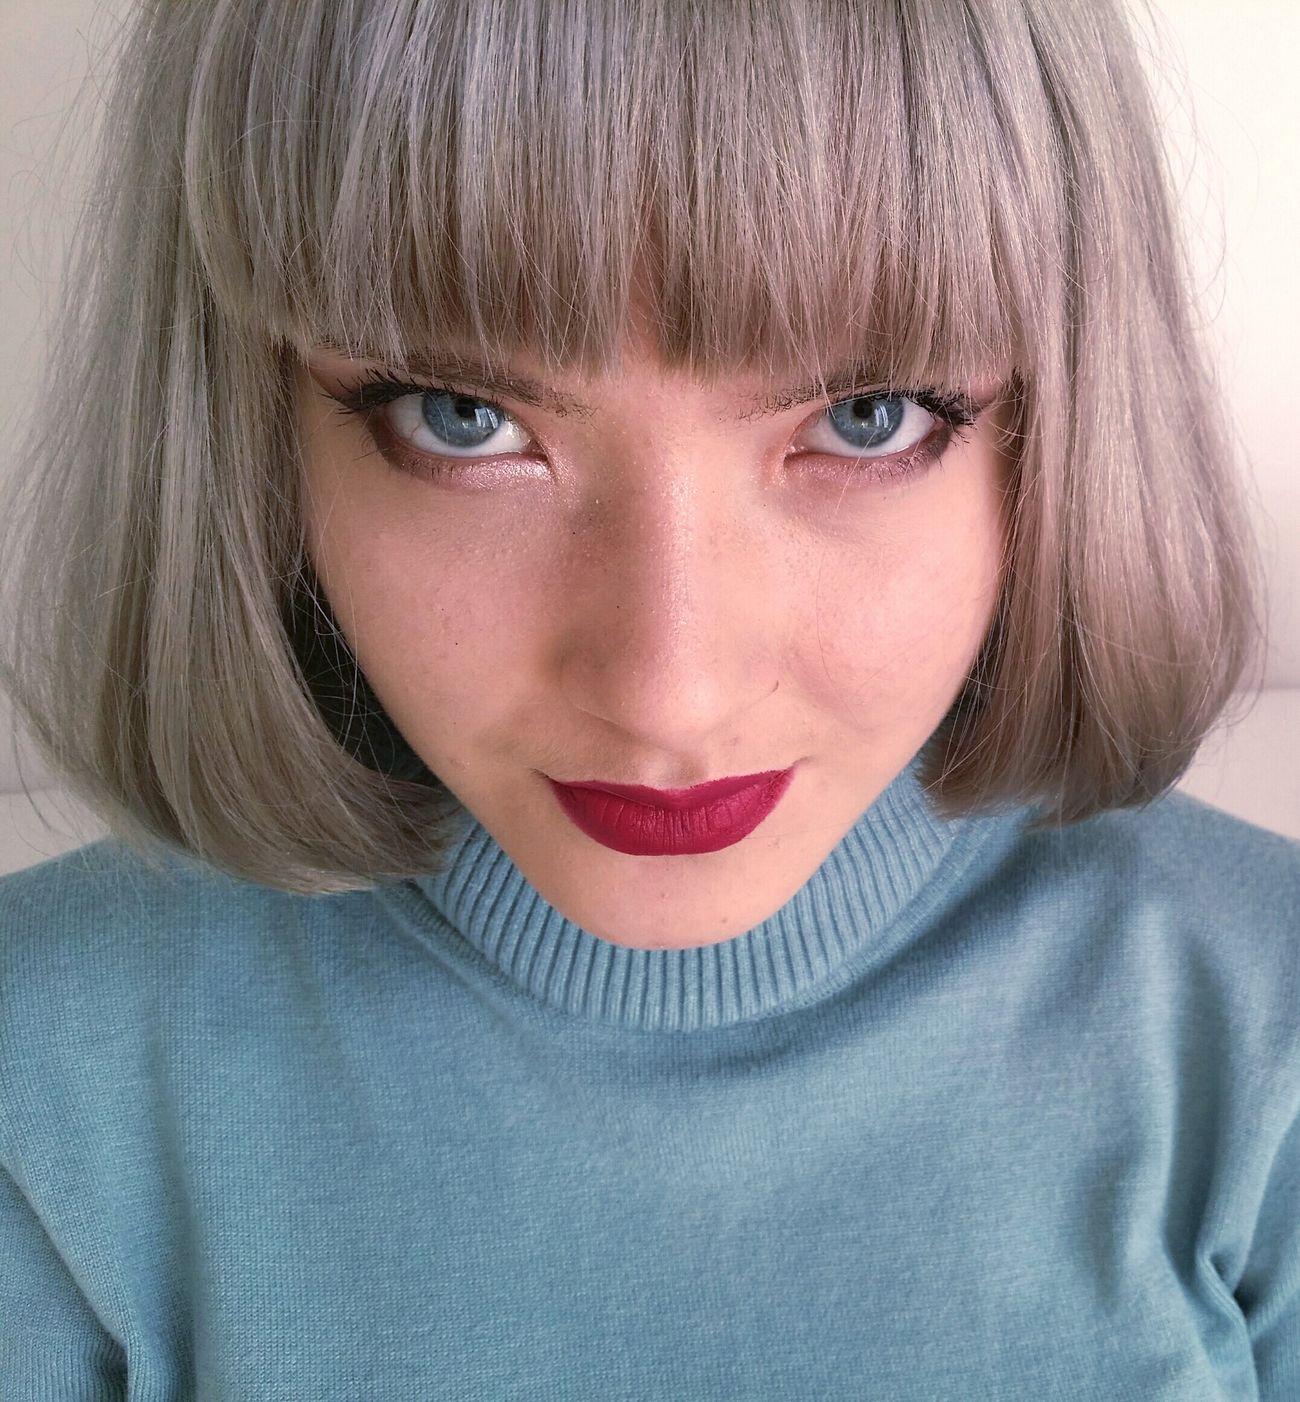 Eyes Blue Eyes Grey Hair Close Up Headshot Person Portrait Bangs Looking At Camera Silver Hair Taking Photos Hello World Pageboy